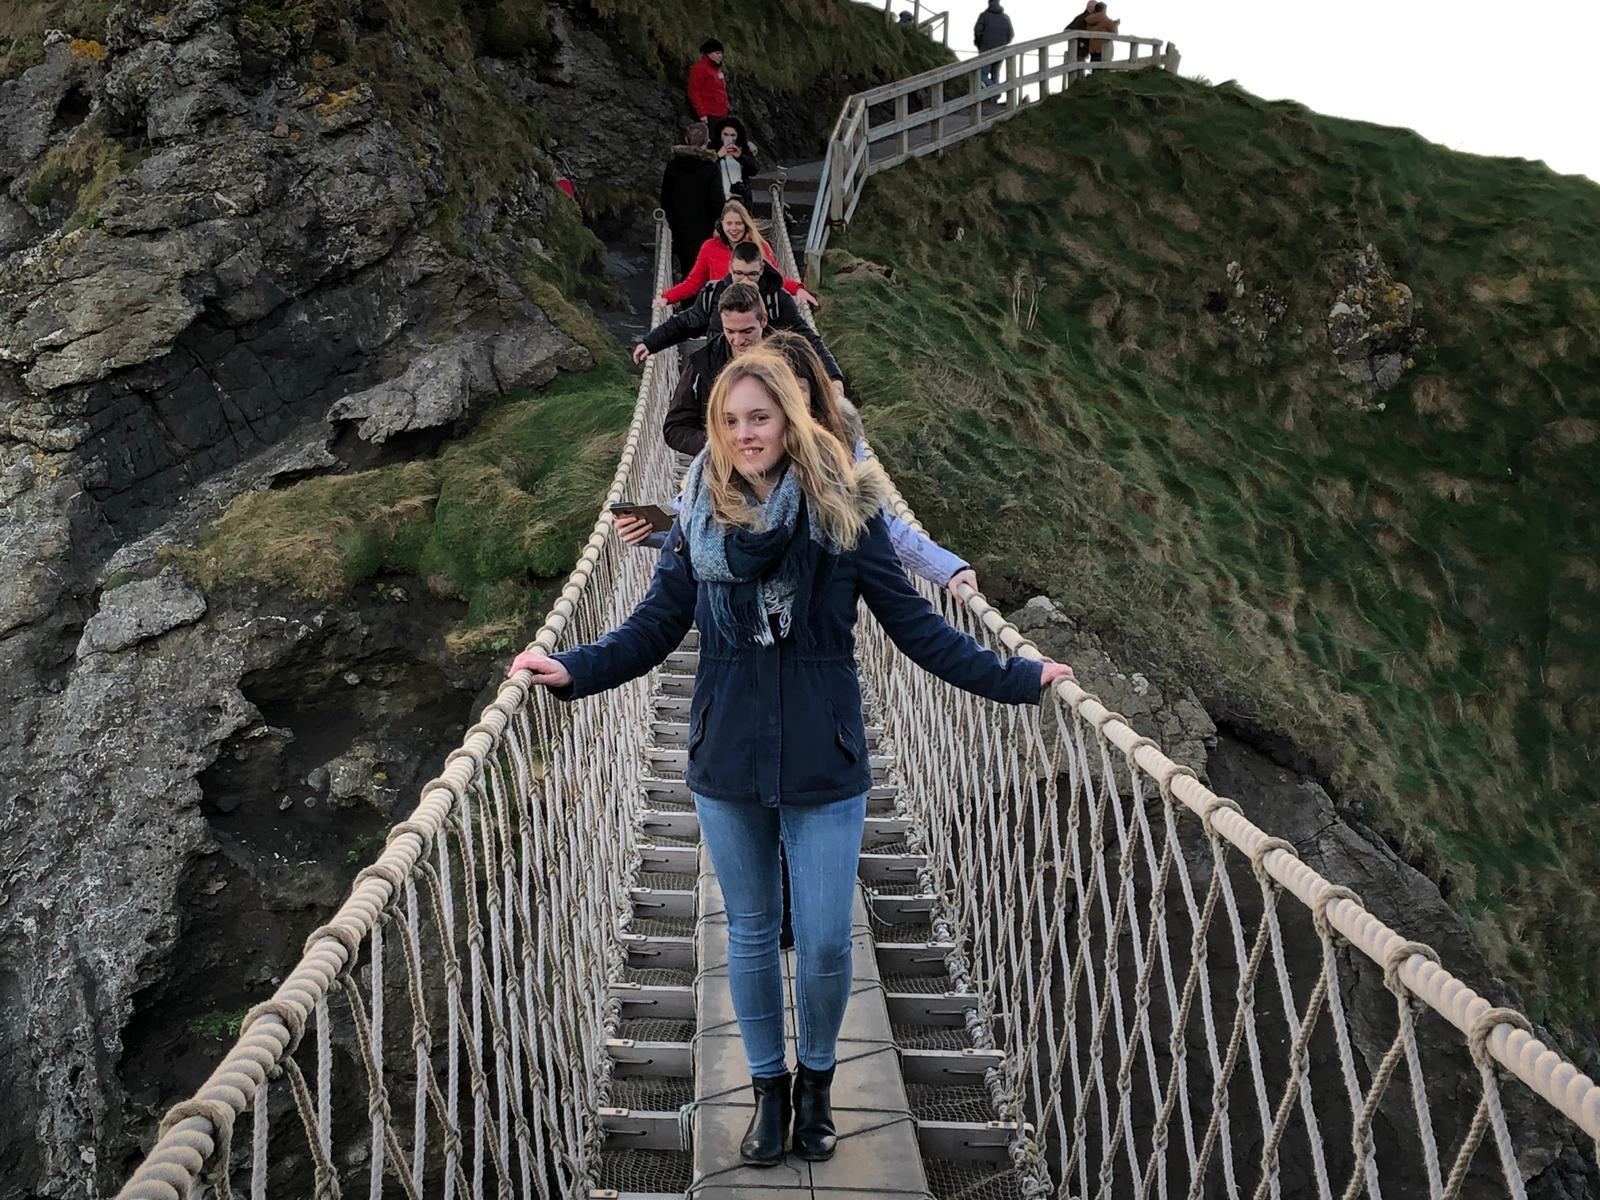 Giant Causeway, Carrick-a-Rede Rope Bridge